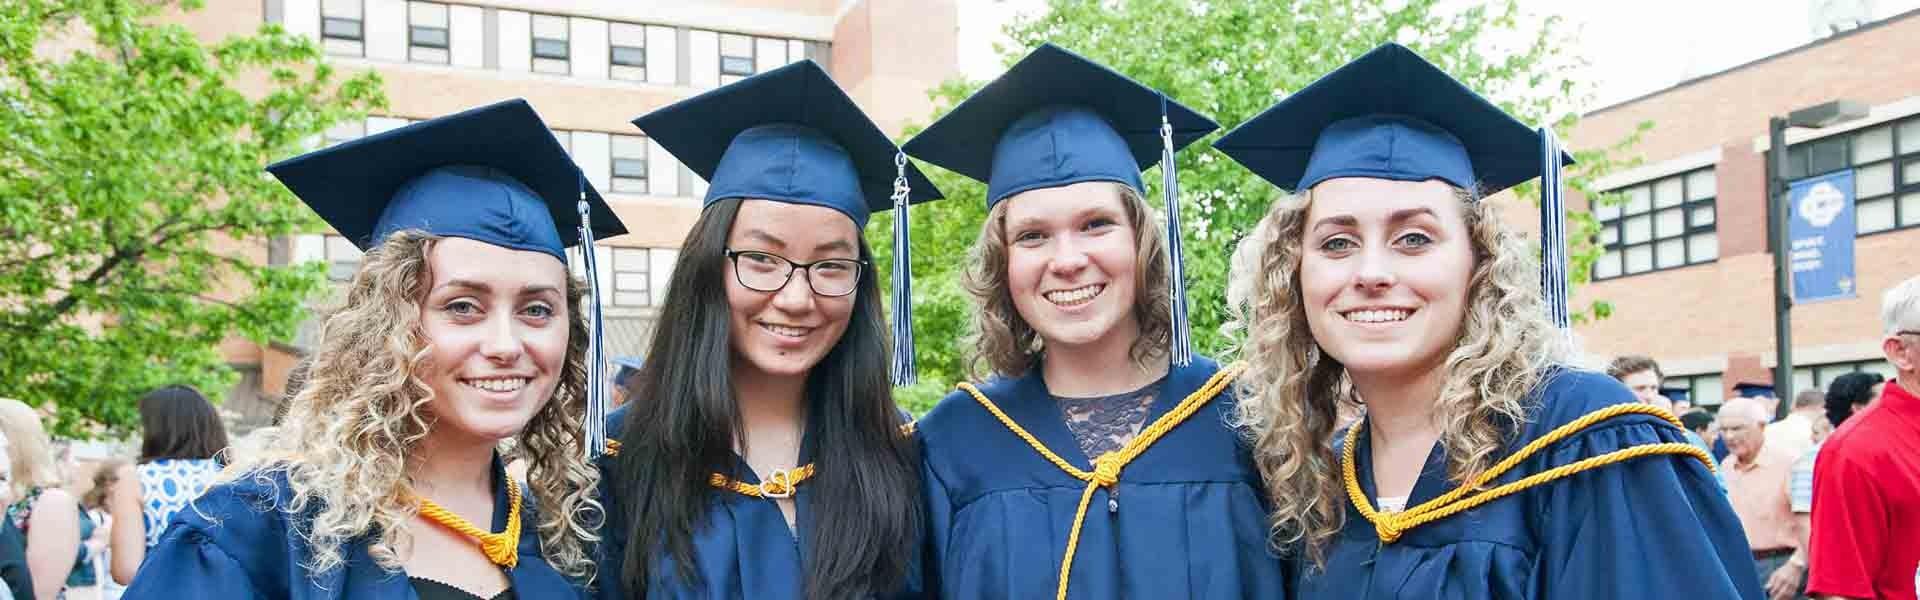 Catholic Central Michigan USA Graduation Banner 2019